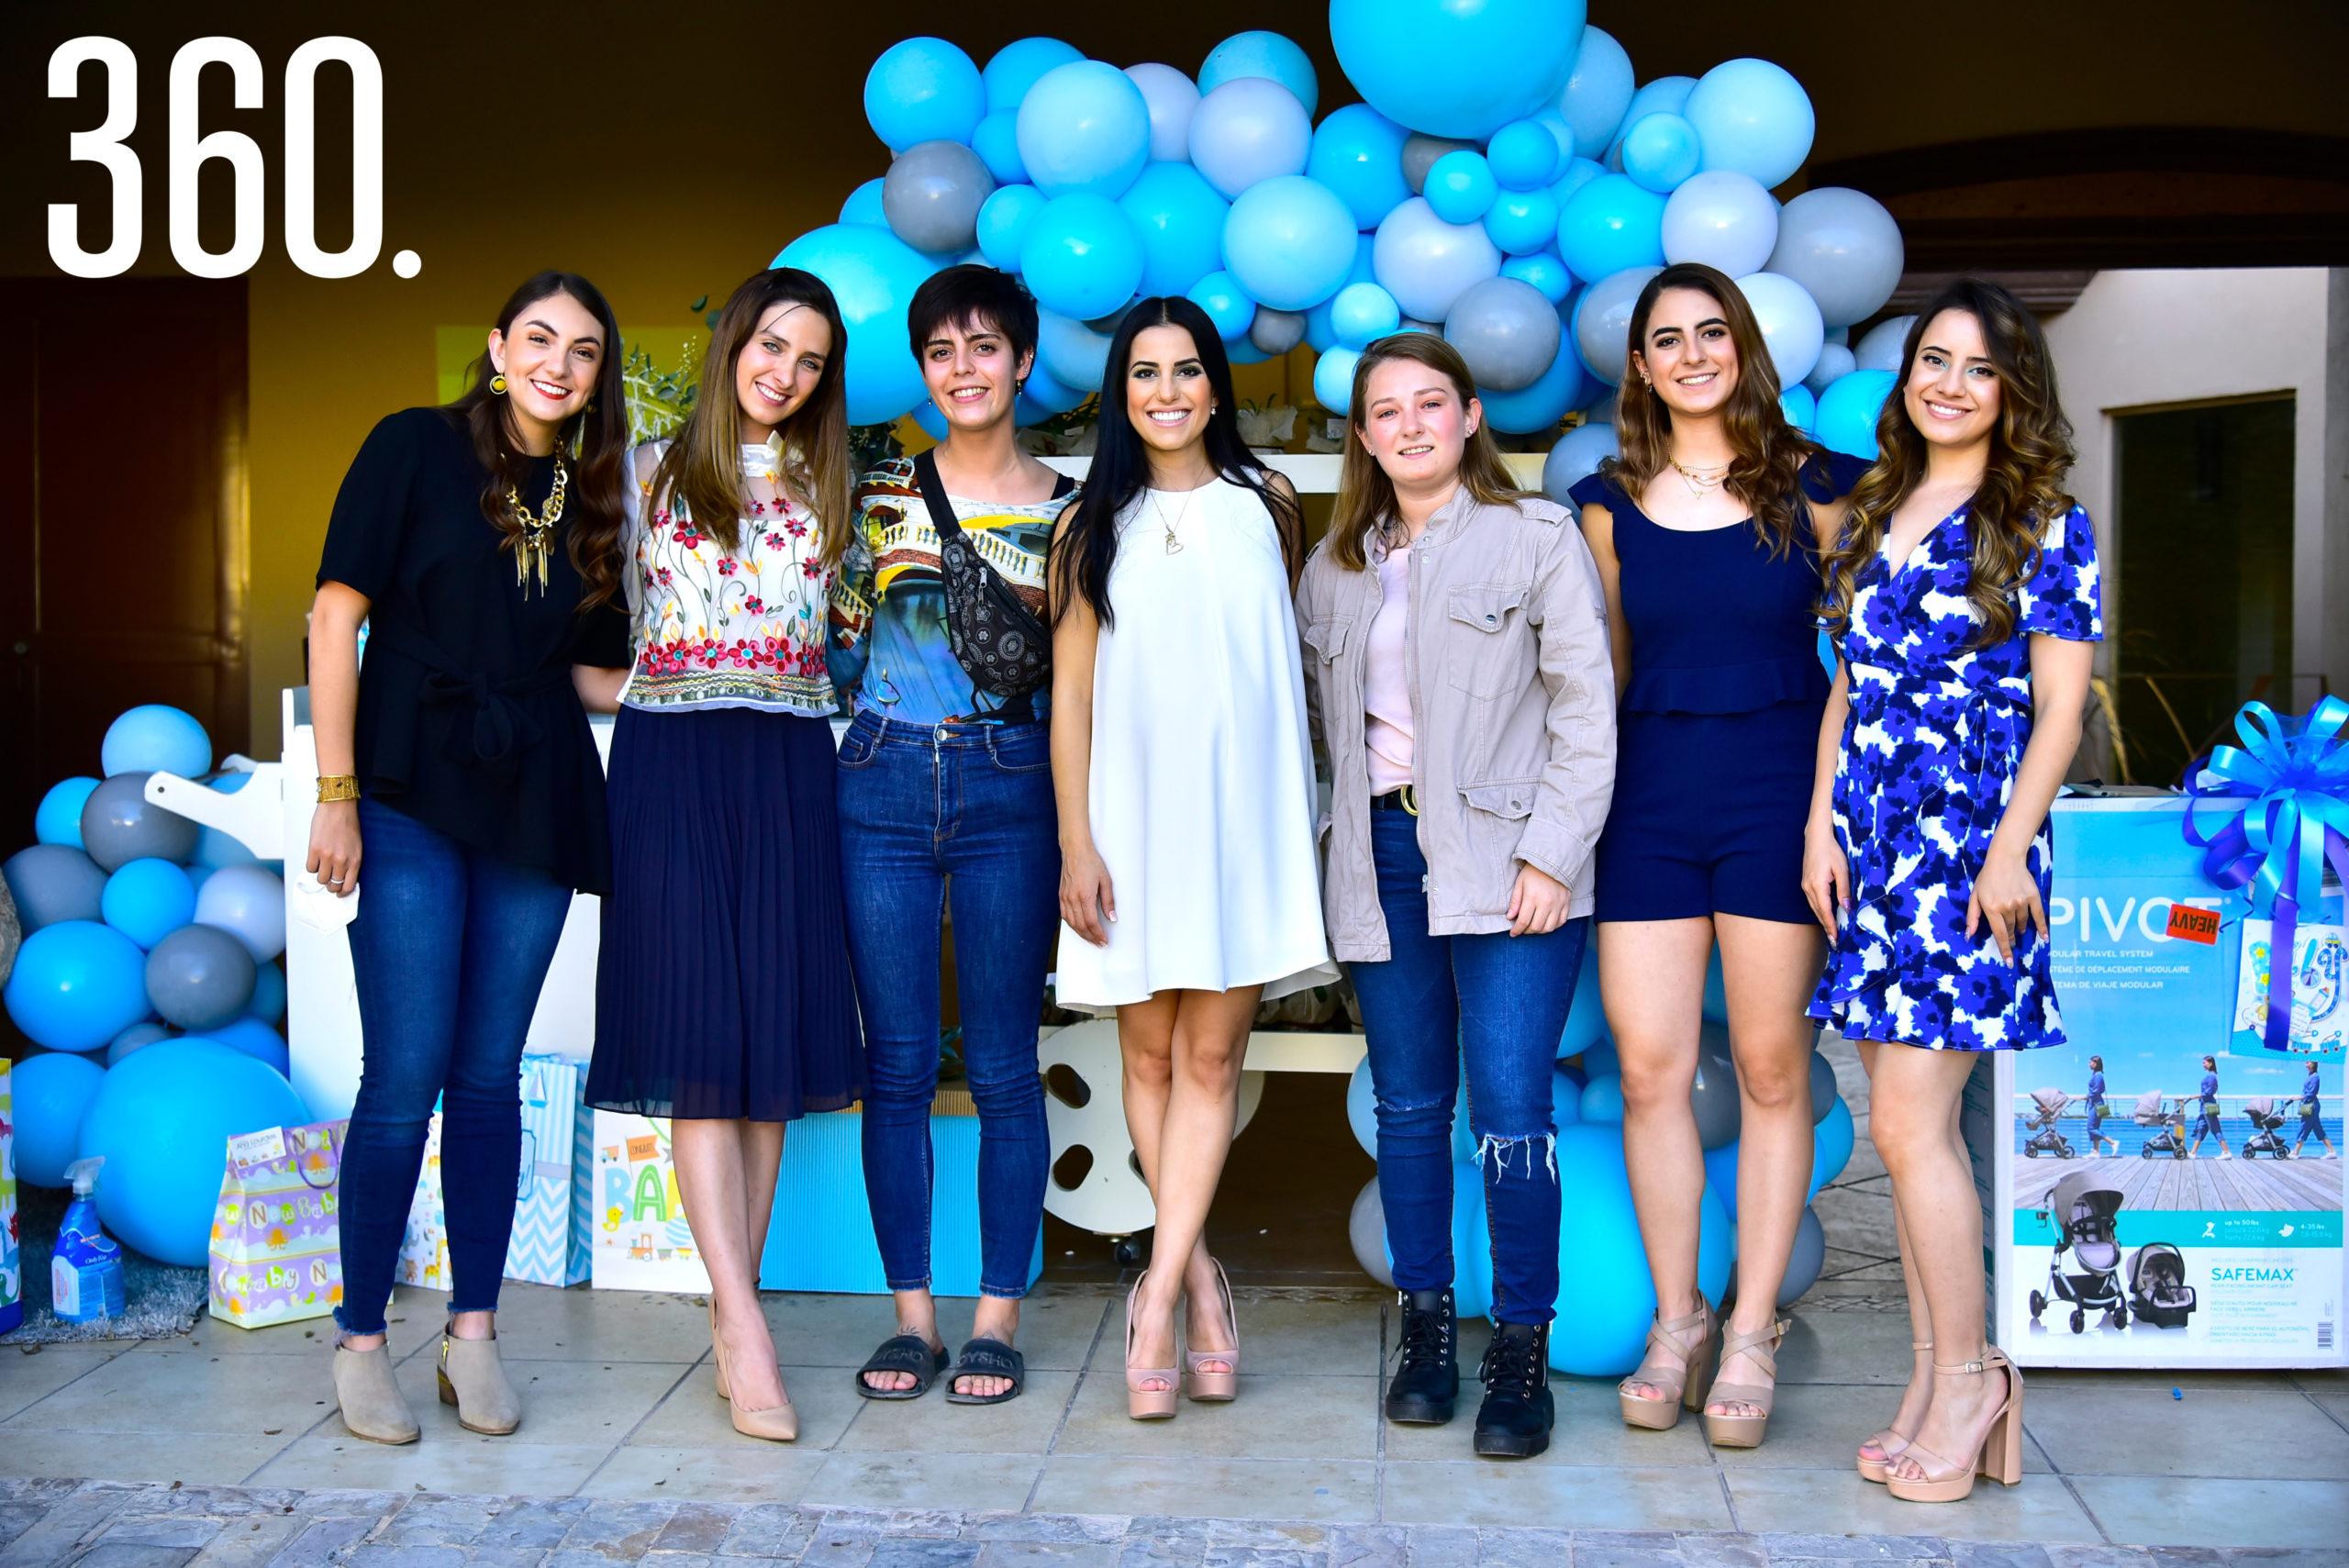 Elsa Treviño, Lucía Garza, María Treviño, Andrea Iga, Ana Sofía Garza, Yelile Iga y Grecia Iga.